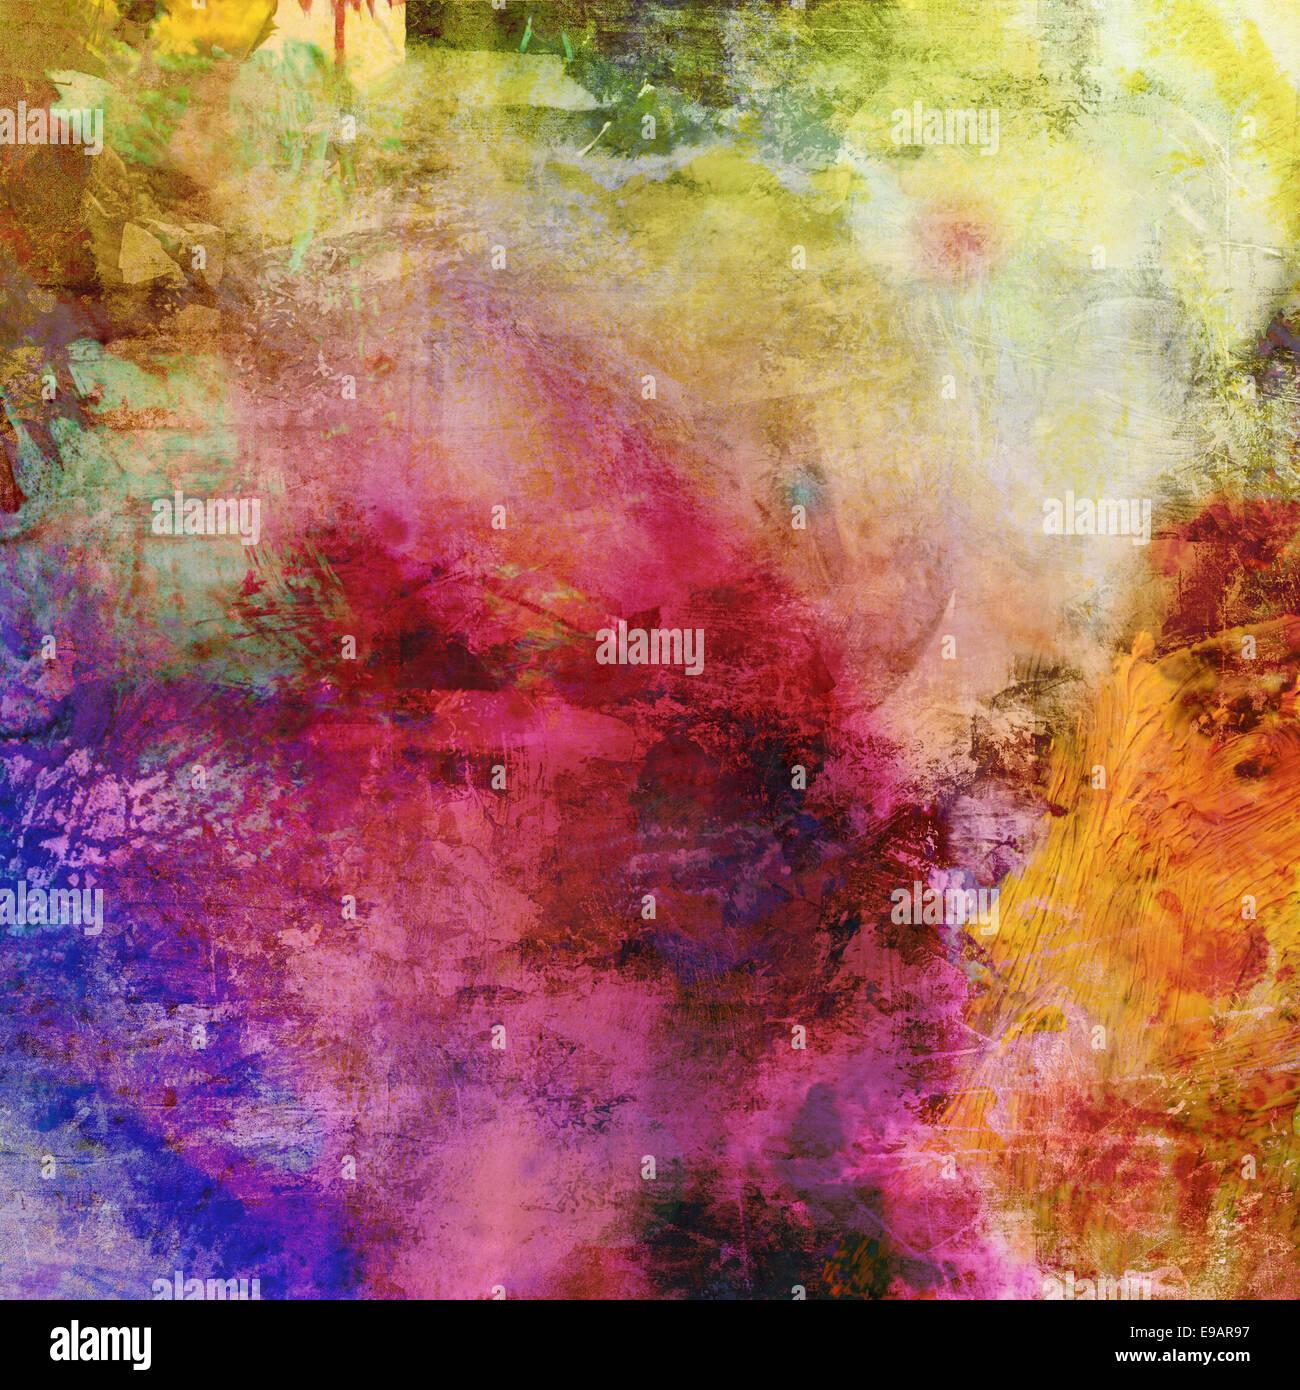 abstract artwork - mixed media grunge - Stock Image